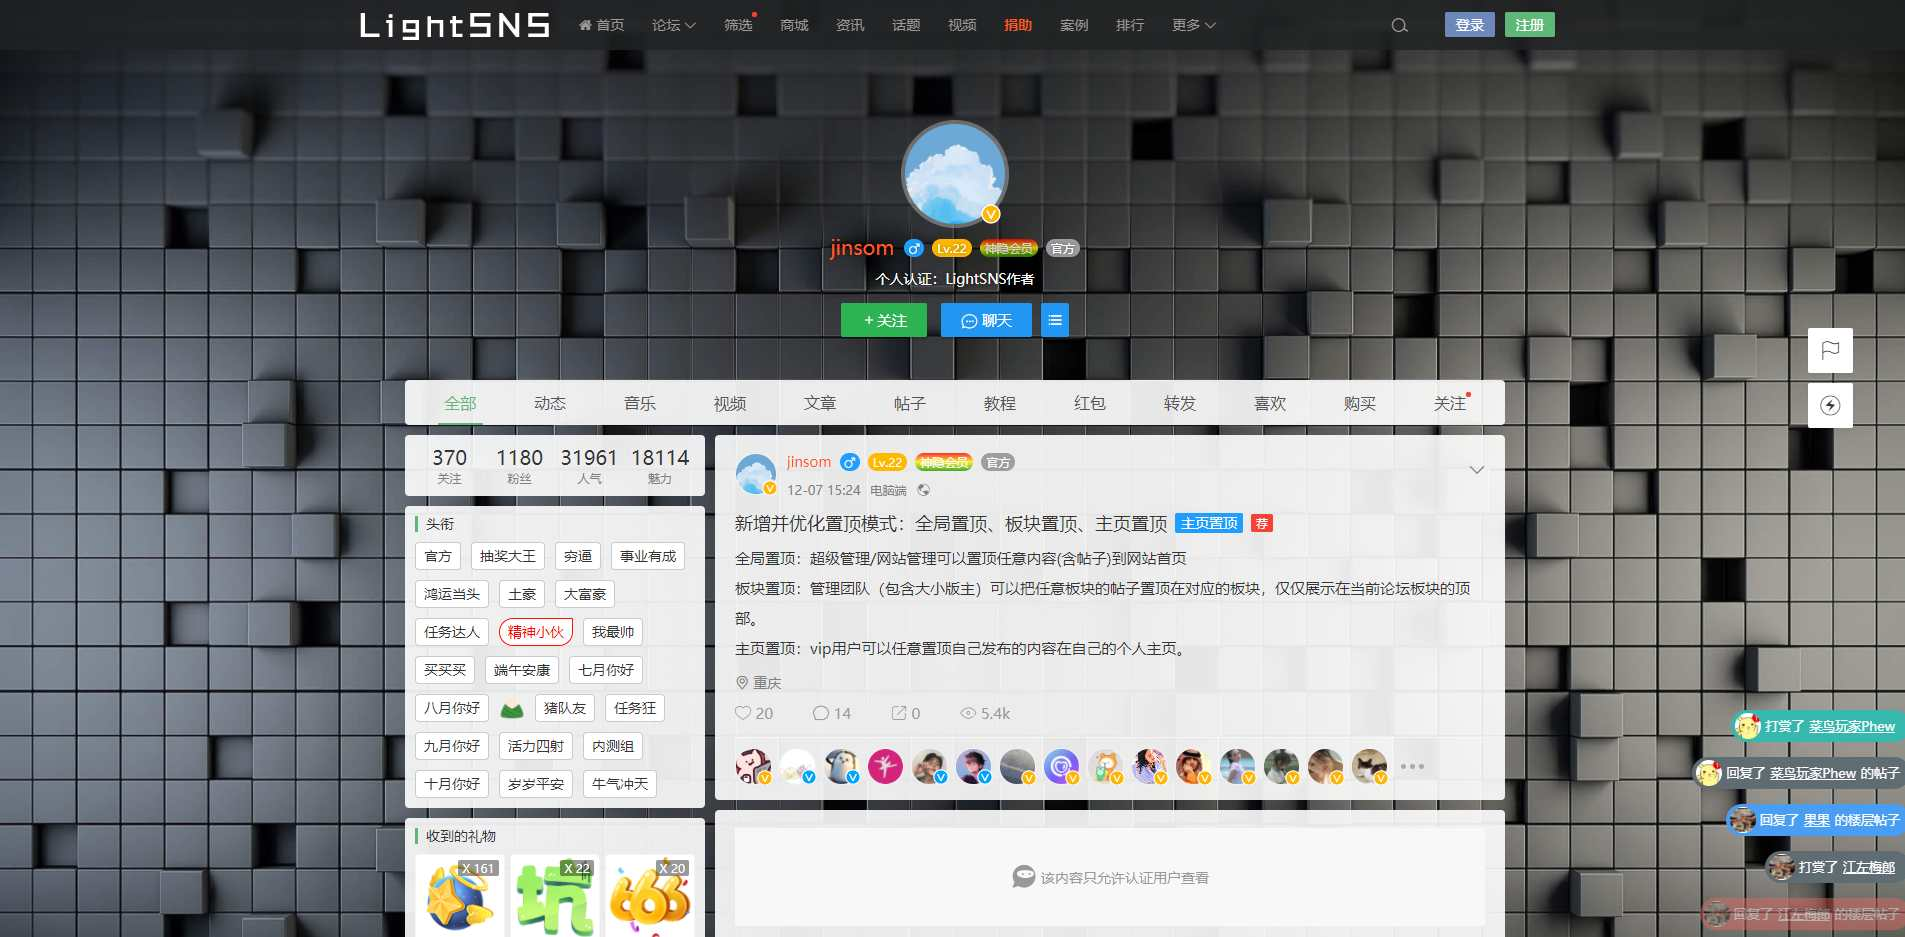 WordPress主题LightSNS v1.6.60强大的社交系统SNS主题免受权-常网小站Miknio